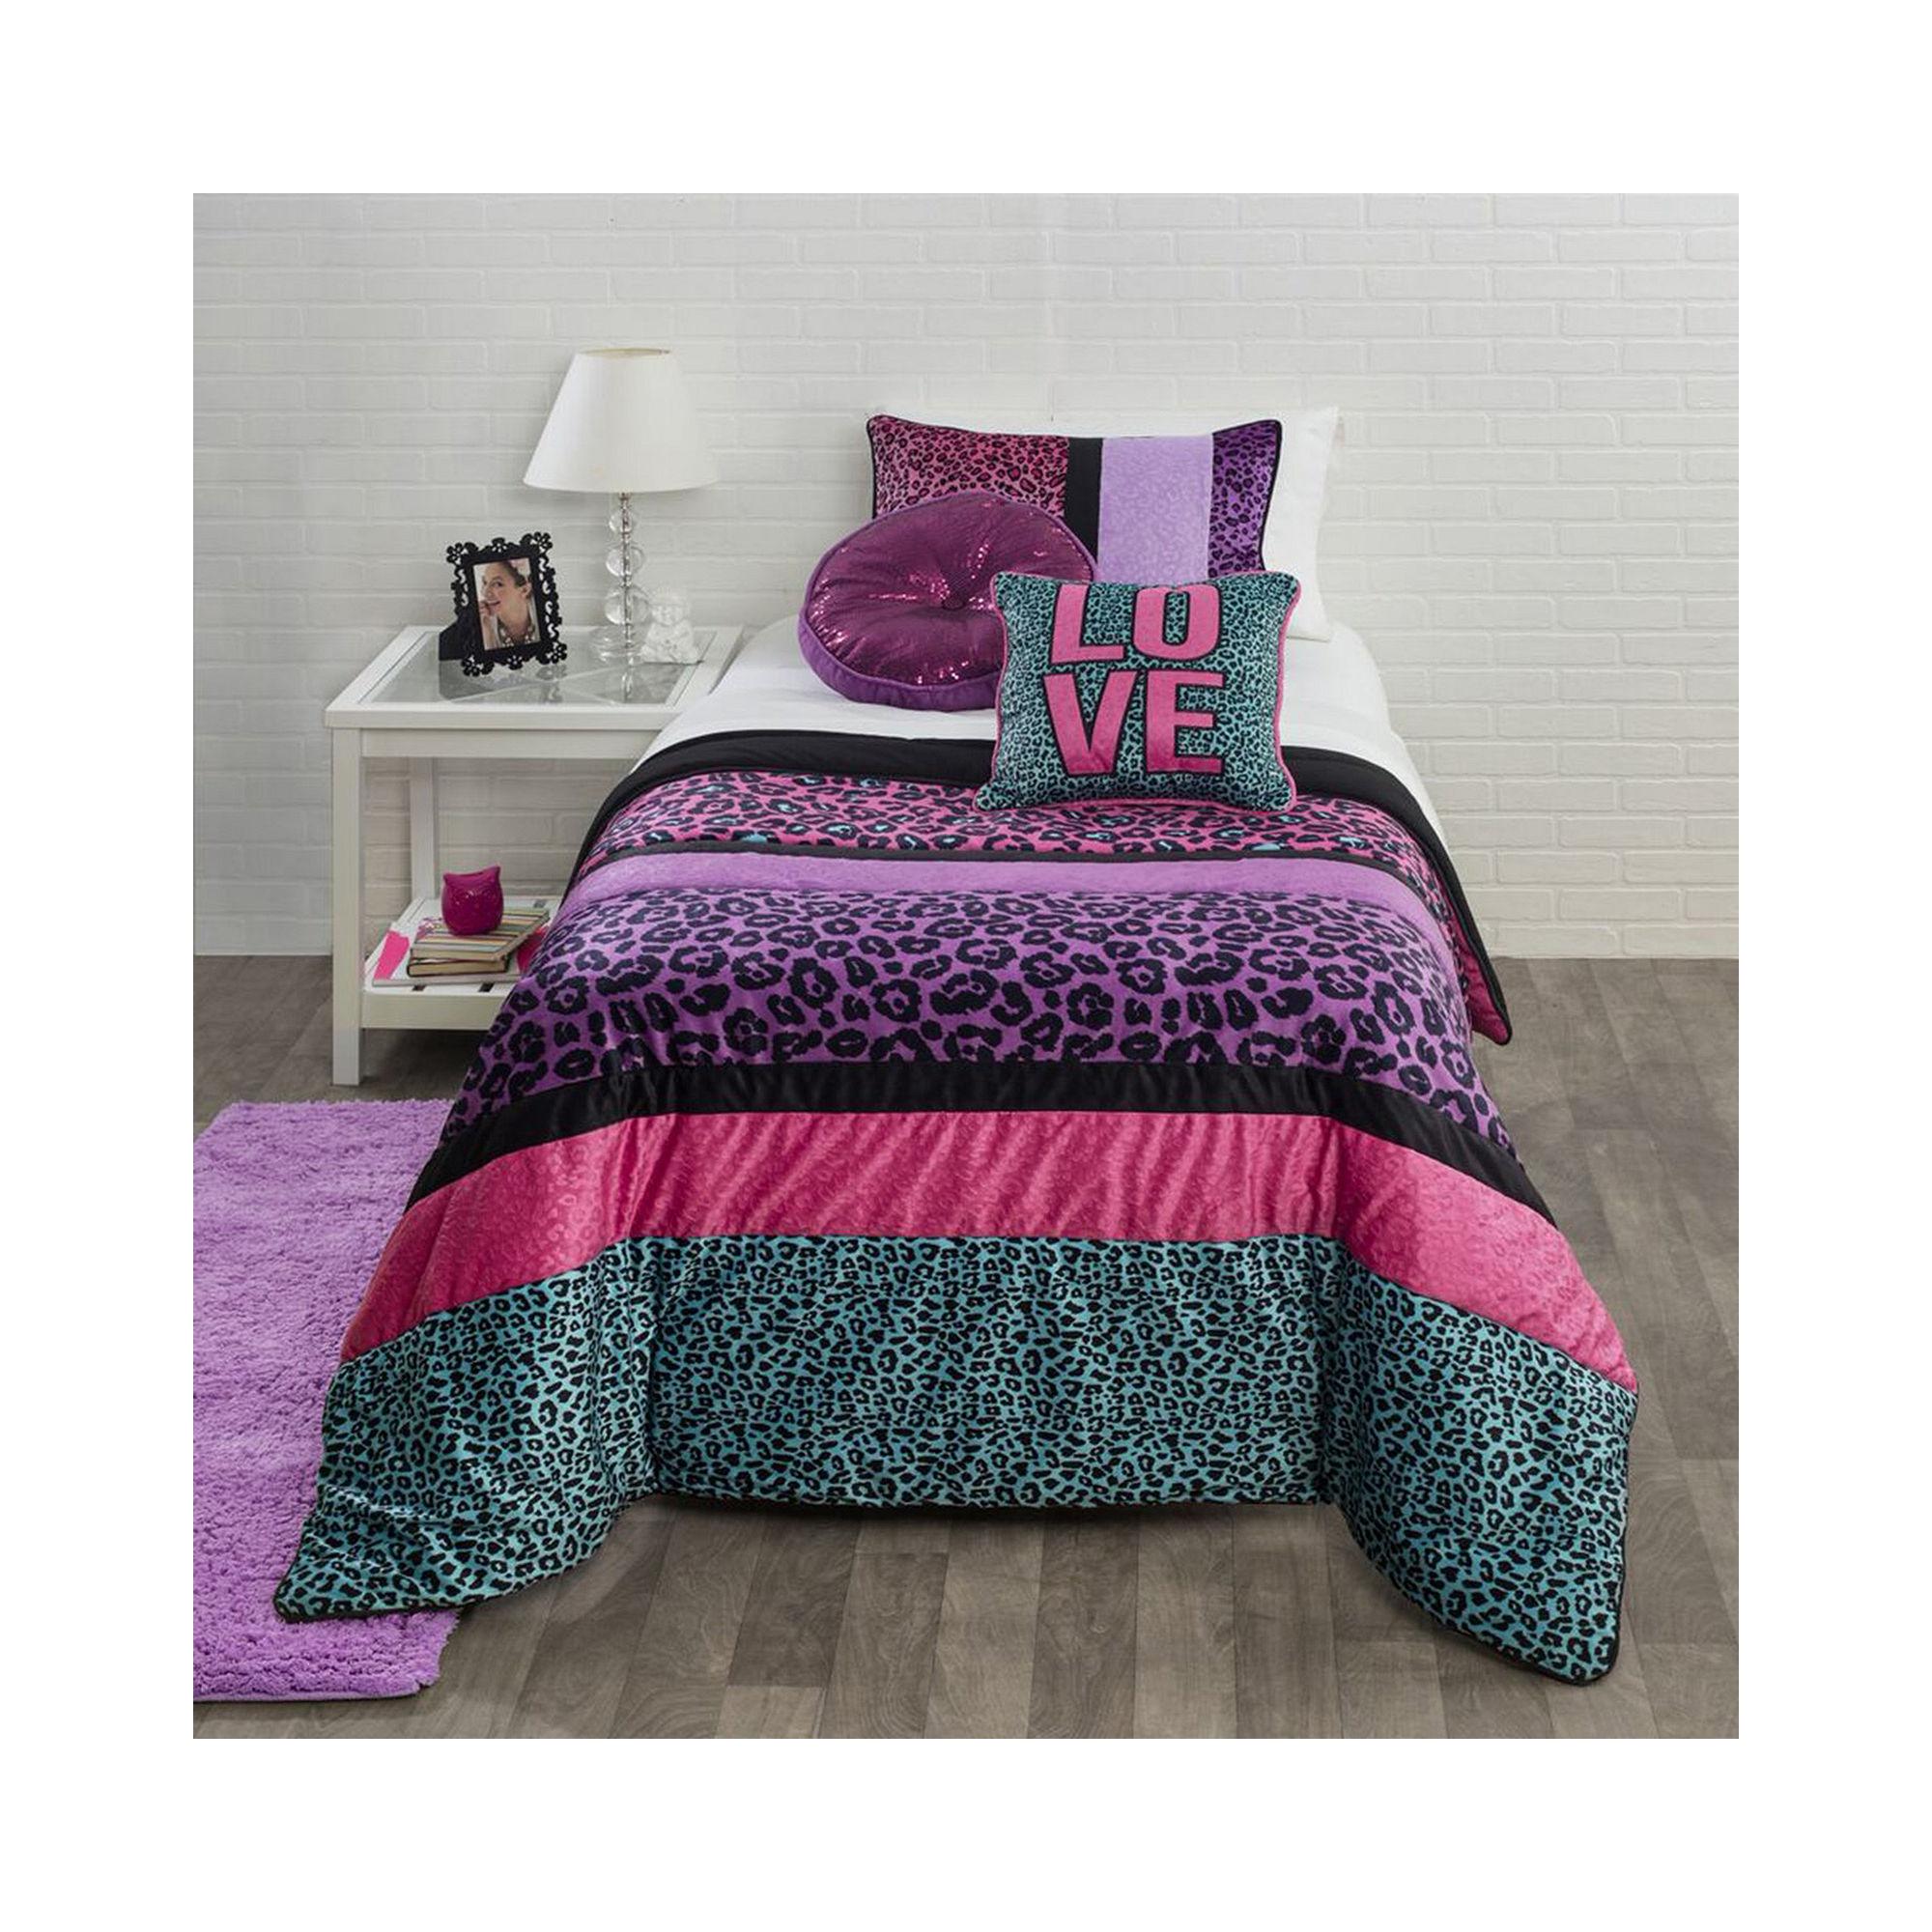 Seventeen comforter set seventeen comforters pink teen bedding for girls by find it at shopwiki - Teen cheetah bedding ...